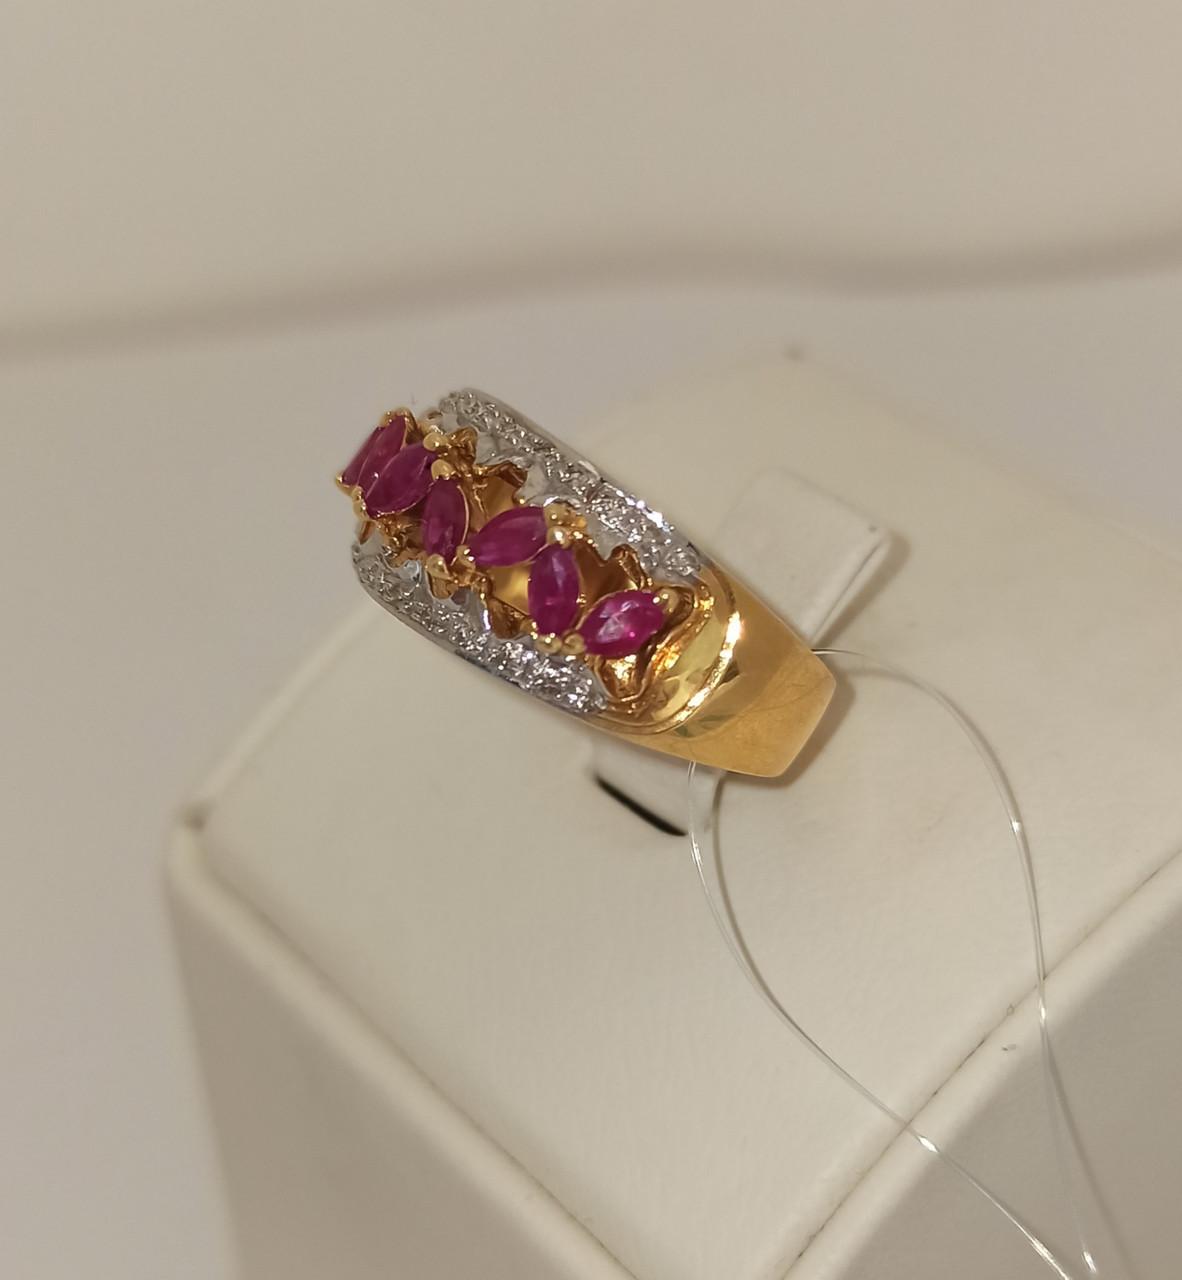 Золотой комплект с бриллиантами и рубинами - фото 2